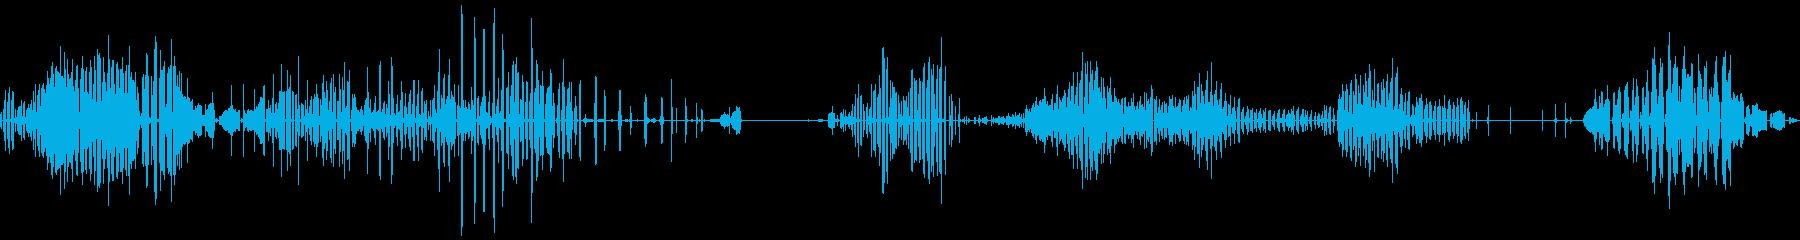 PLOVER / LAPWING ...の再生済みの波形